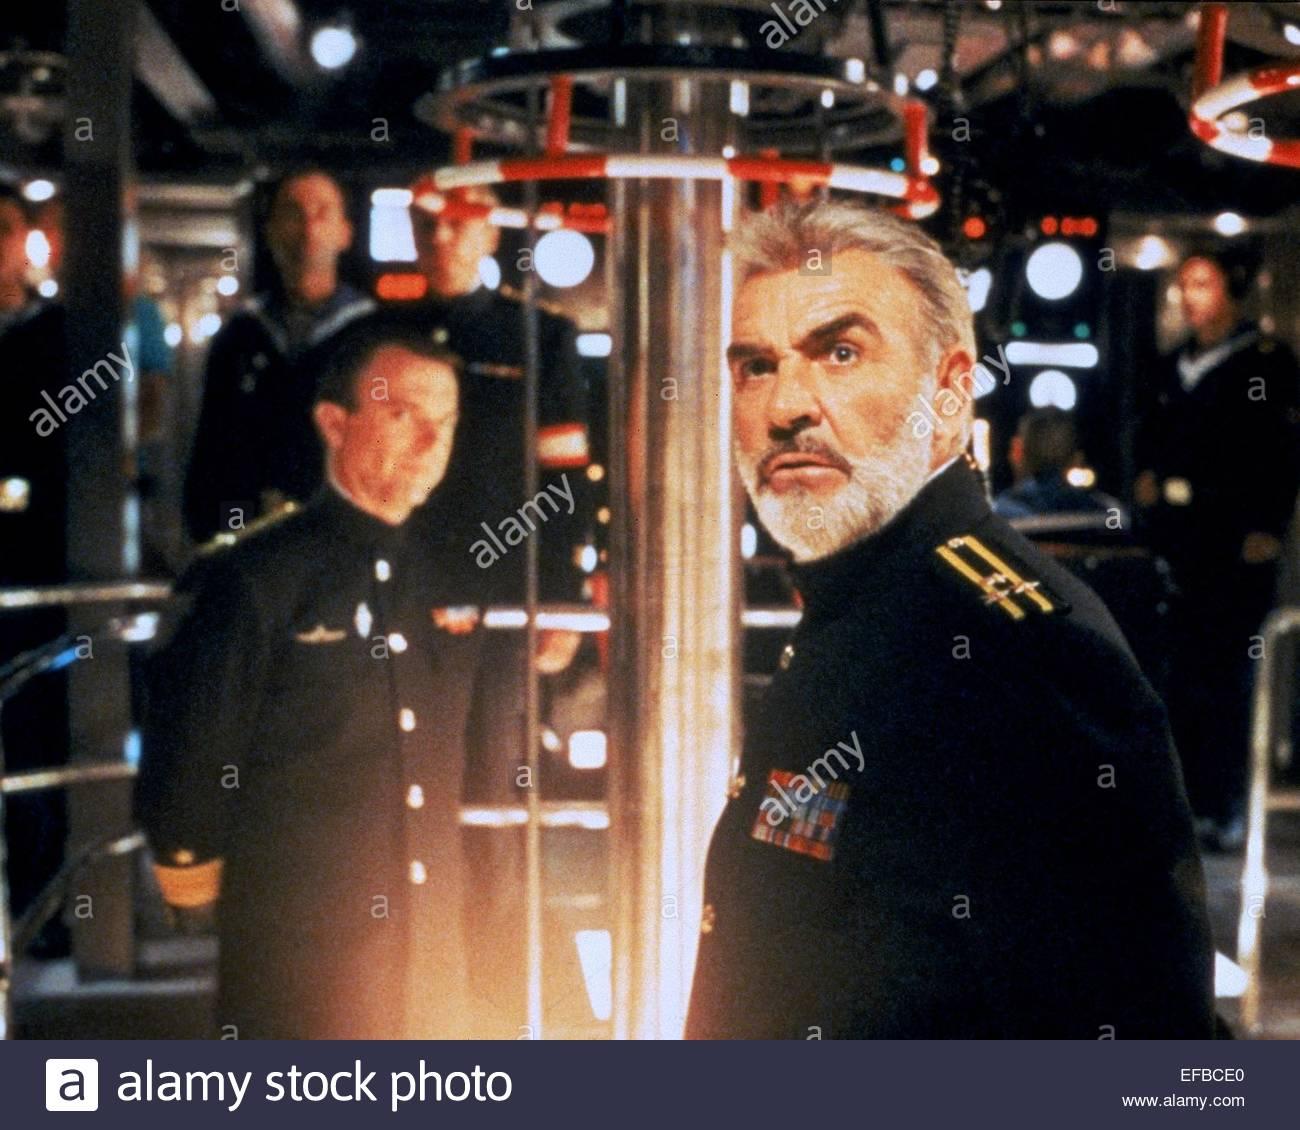 Familia En Construccion The Hunt For Red October 1990 A Great American Espionage Thriller Film